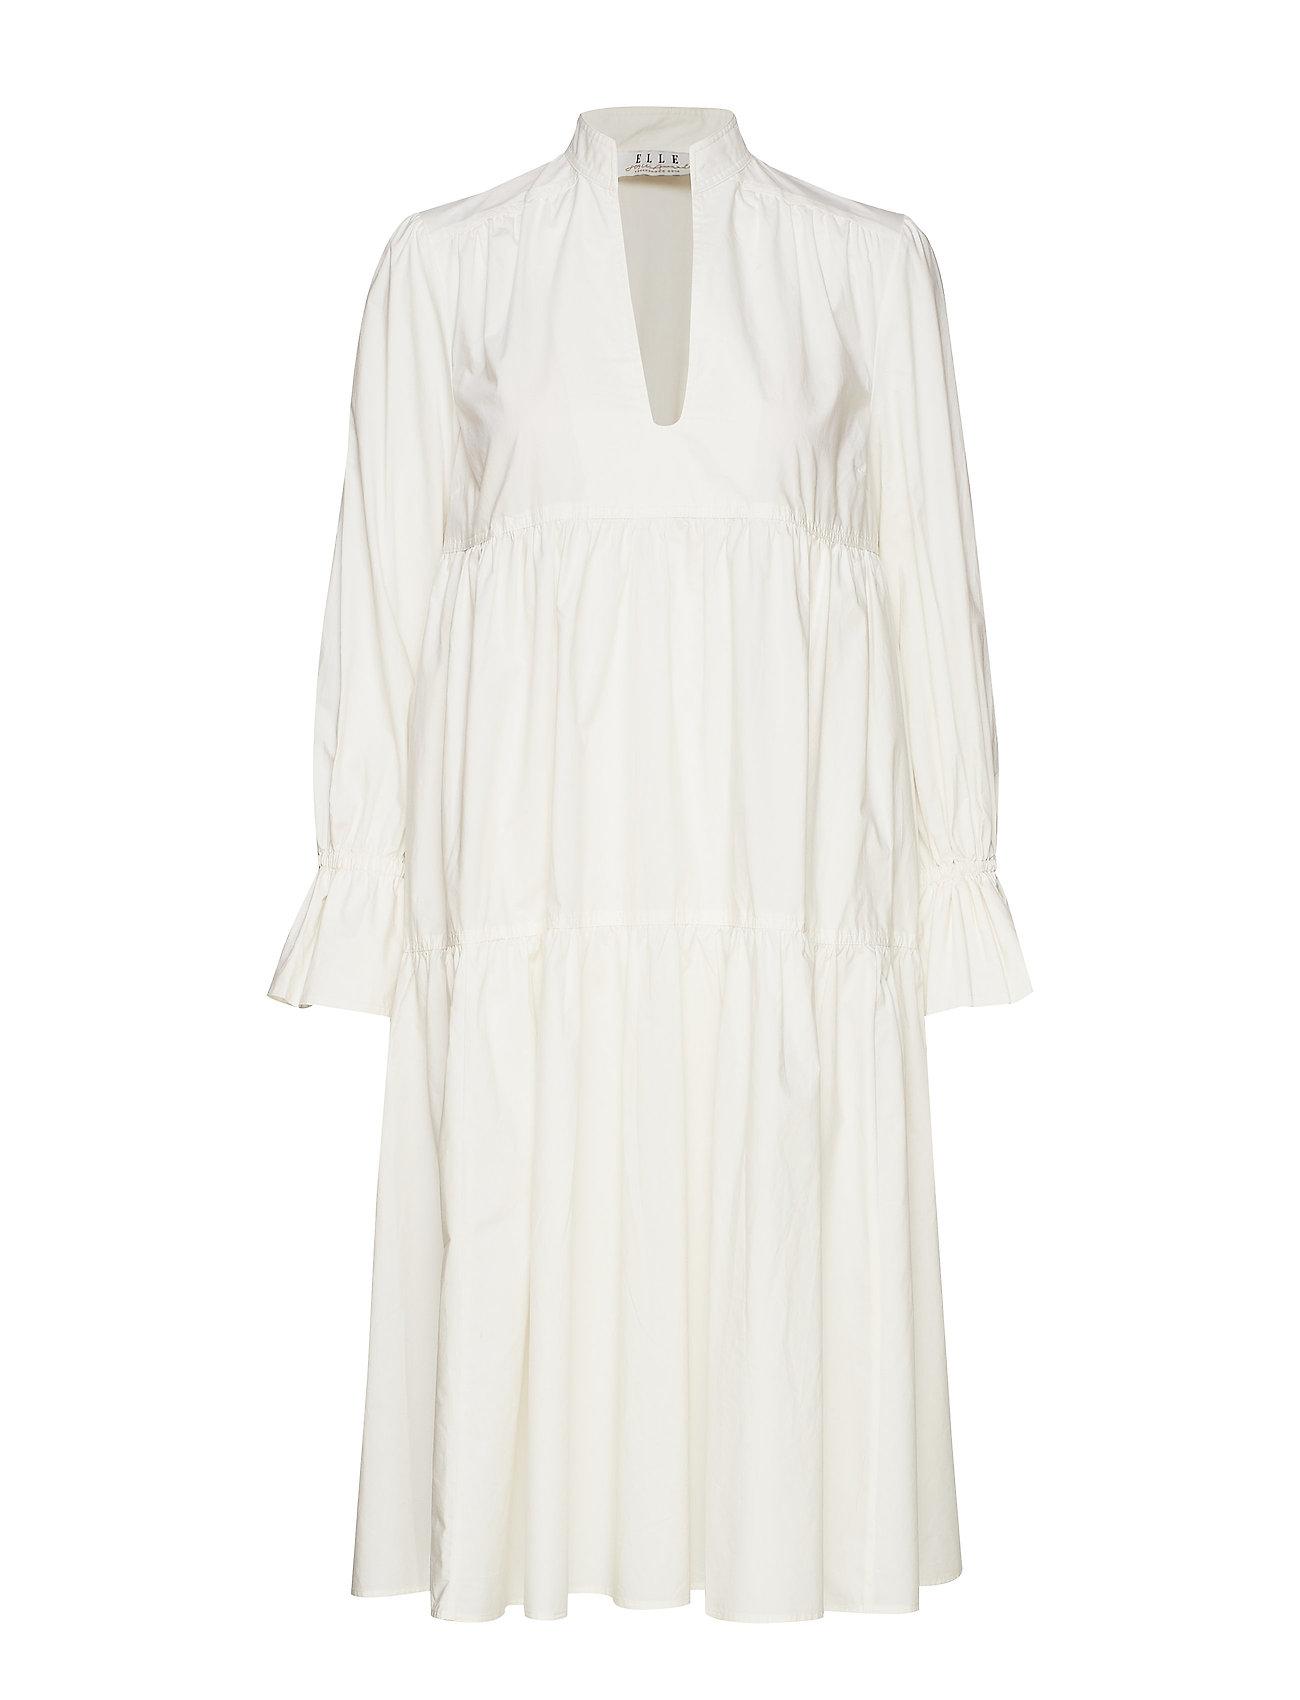 Elle Style Awards Collection 2019 Madrid Poplin Dress - WHITE